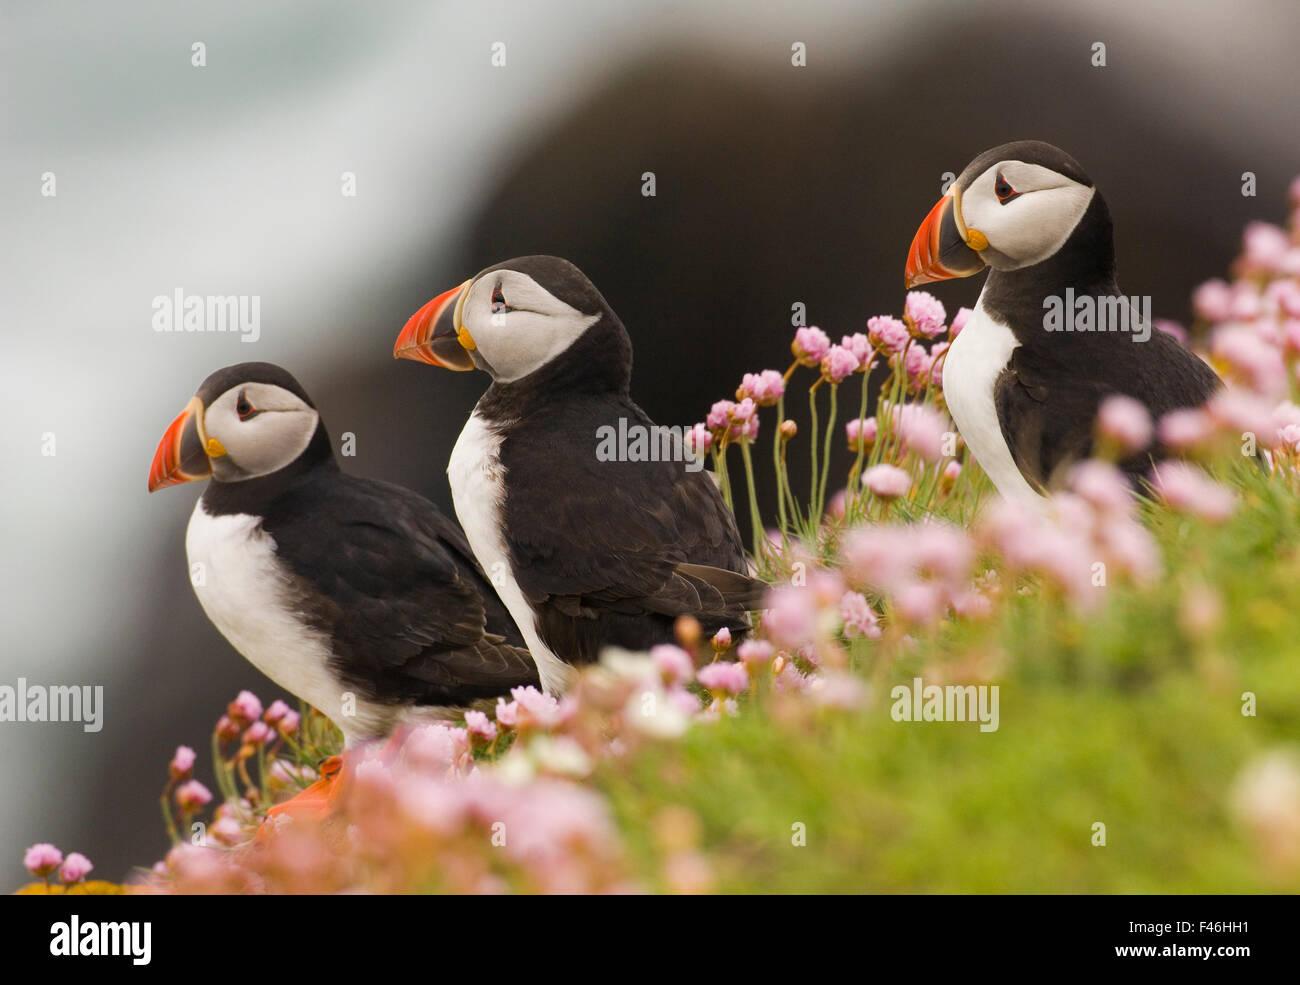 Puffins (Fratercula arctica) among coastal thrift. Saltee Islands, Ireland, UK, July. - Stock Image